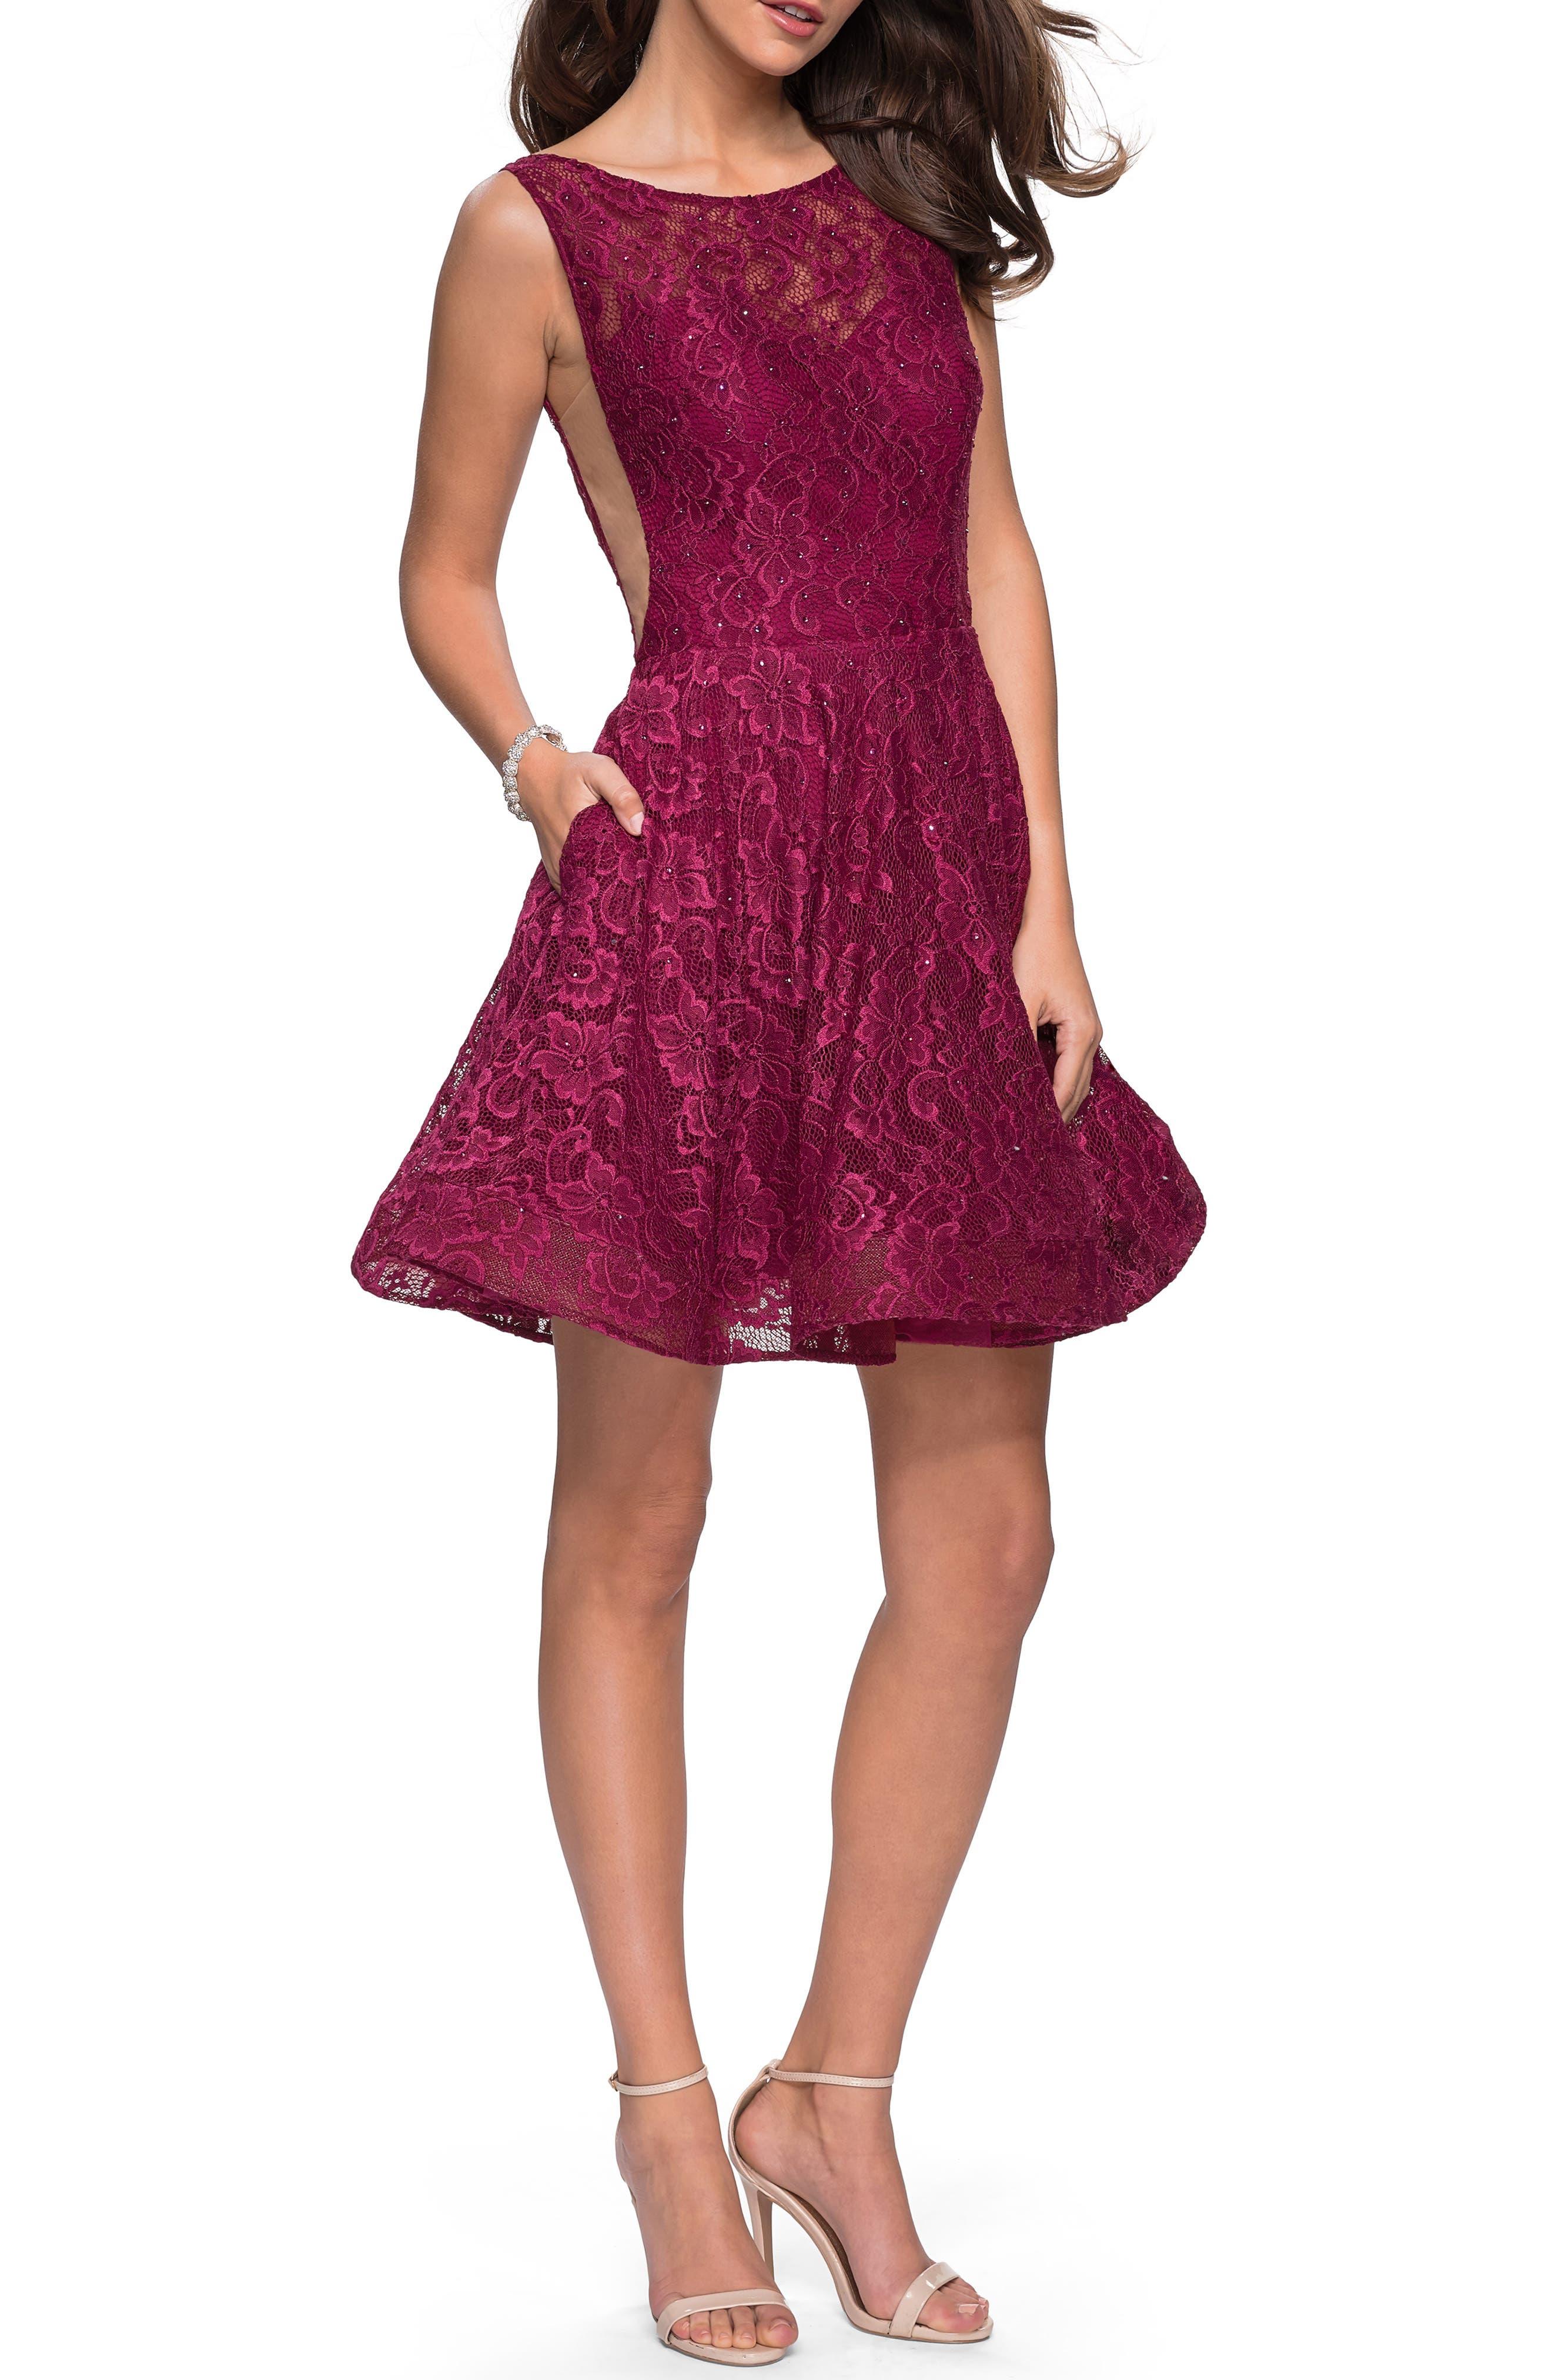 LA FEMME Lace Fit & Flare Party Dress in Boysenberry